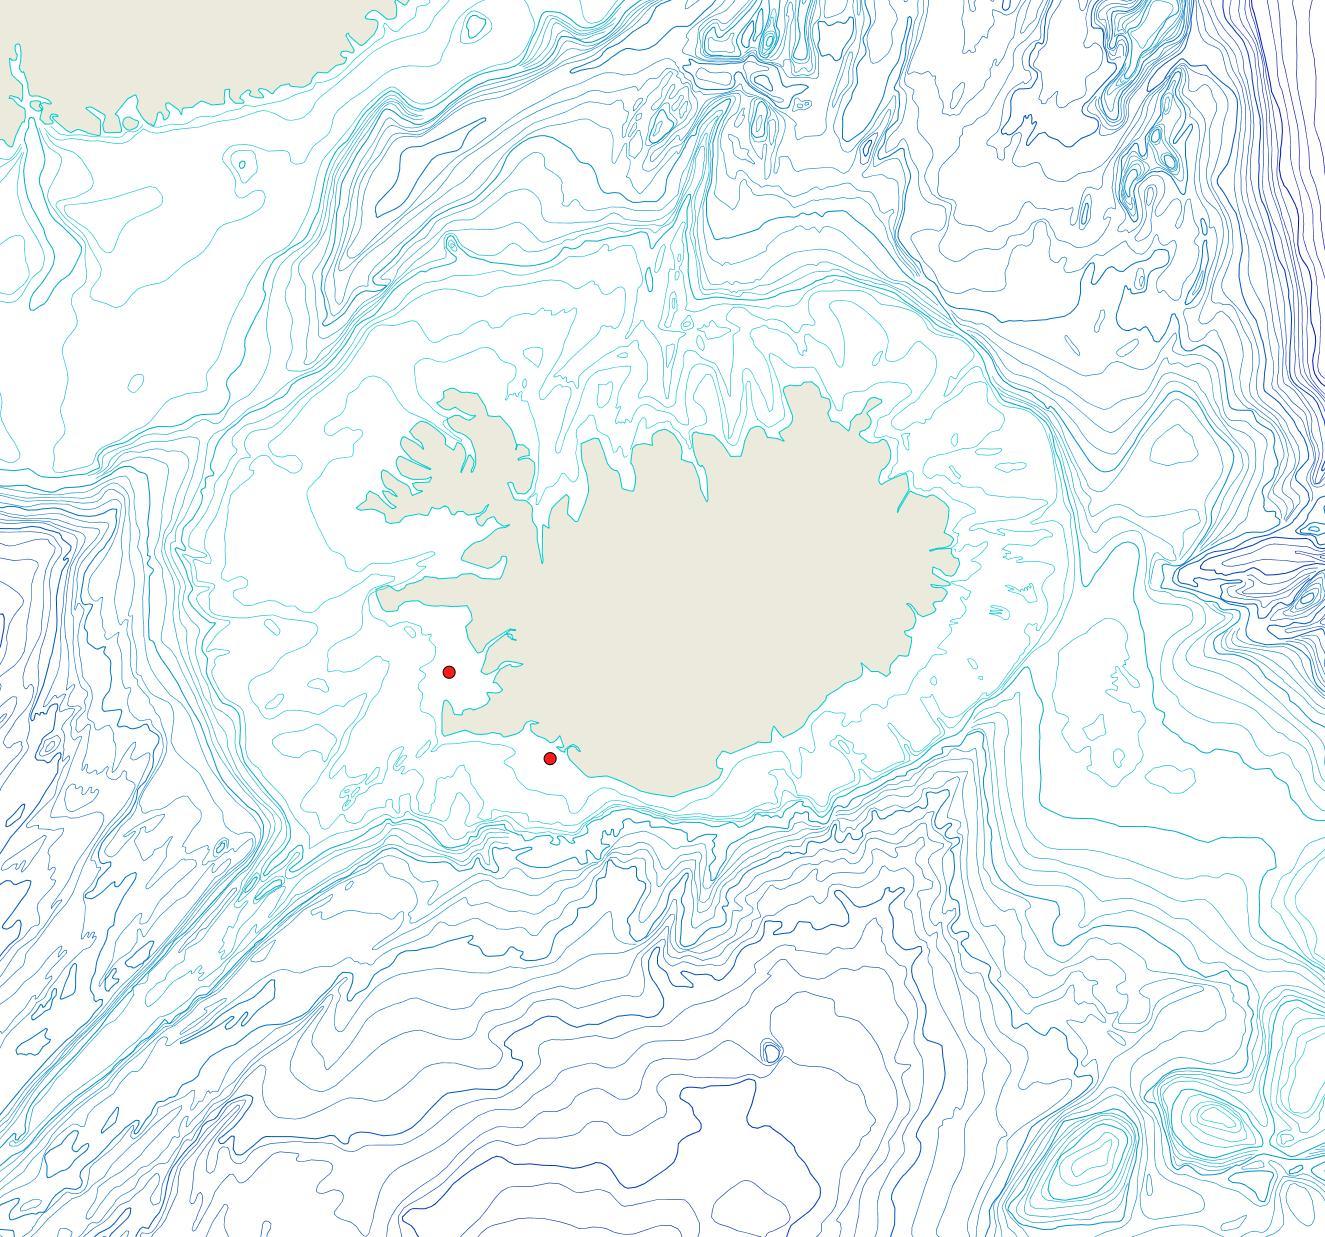 Útbreiðsla Tubulipora liliacea(Bioice samples, red dots)